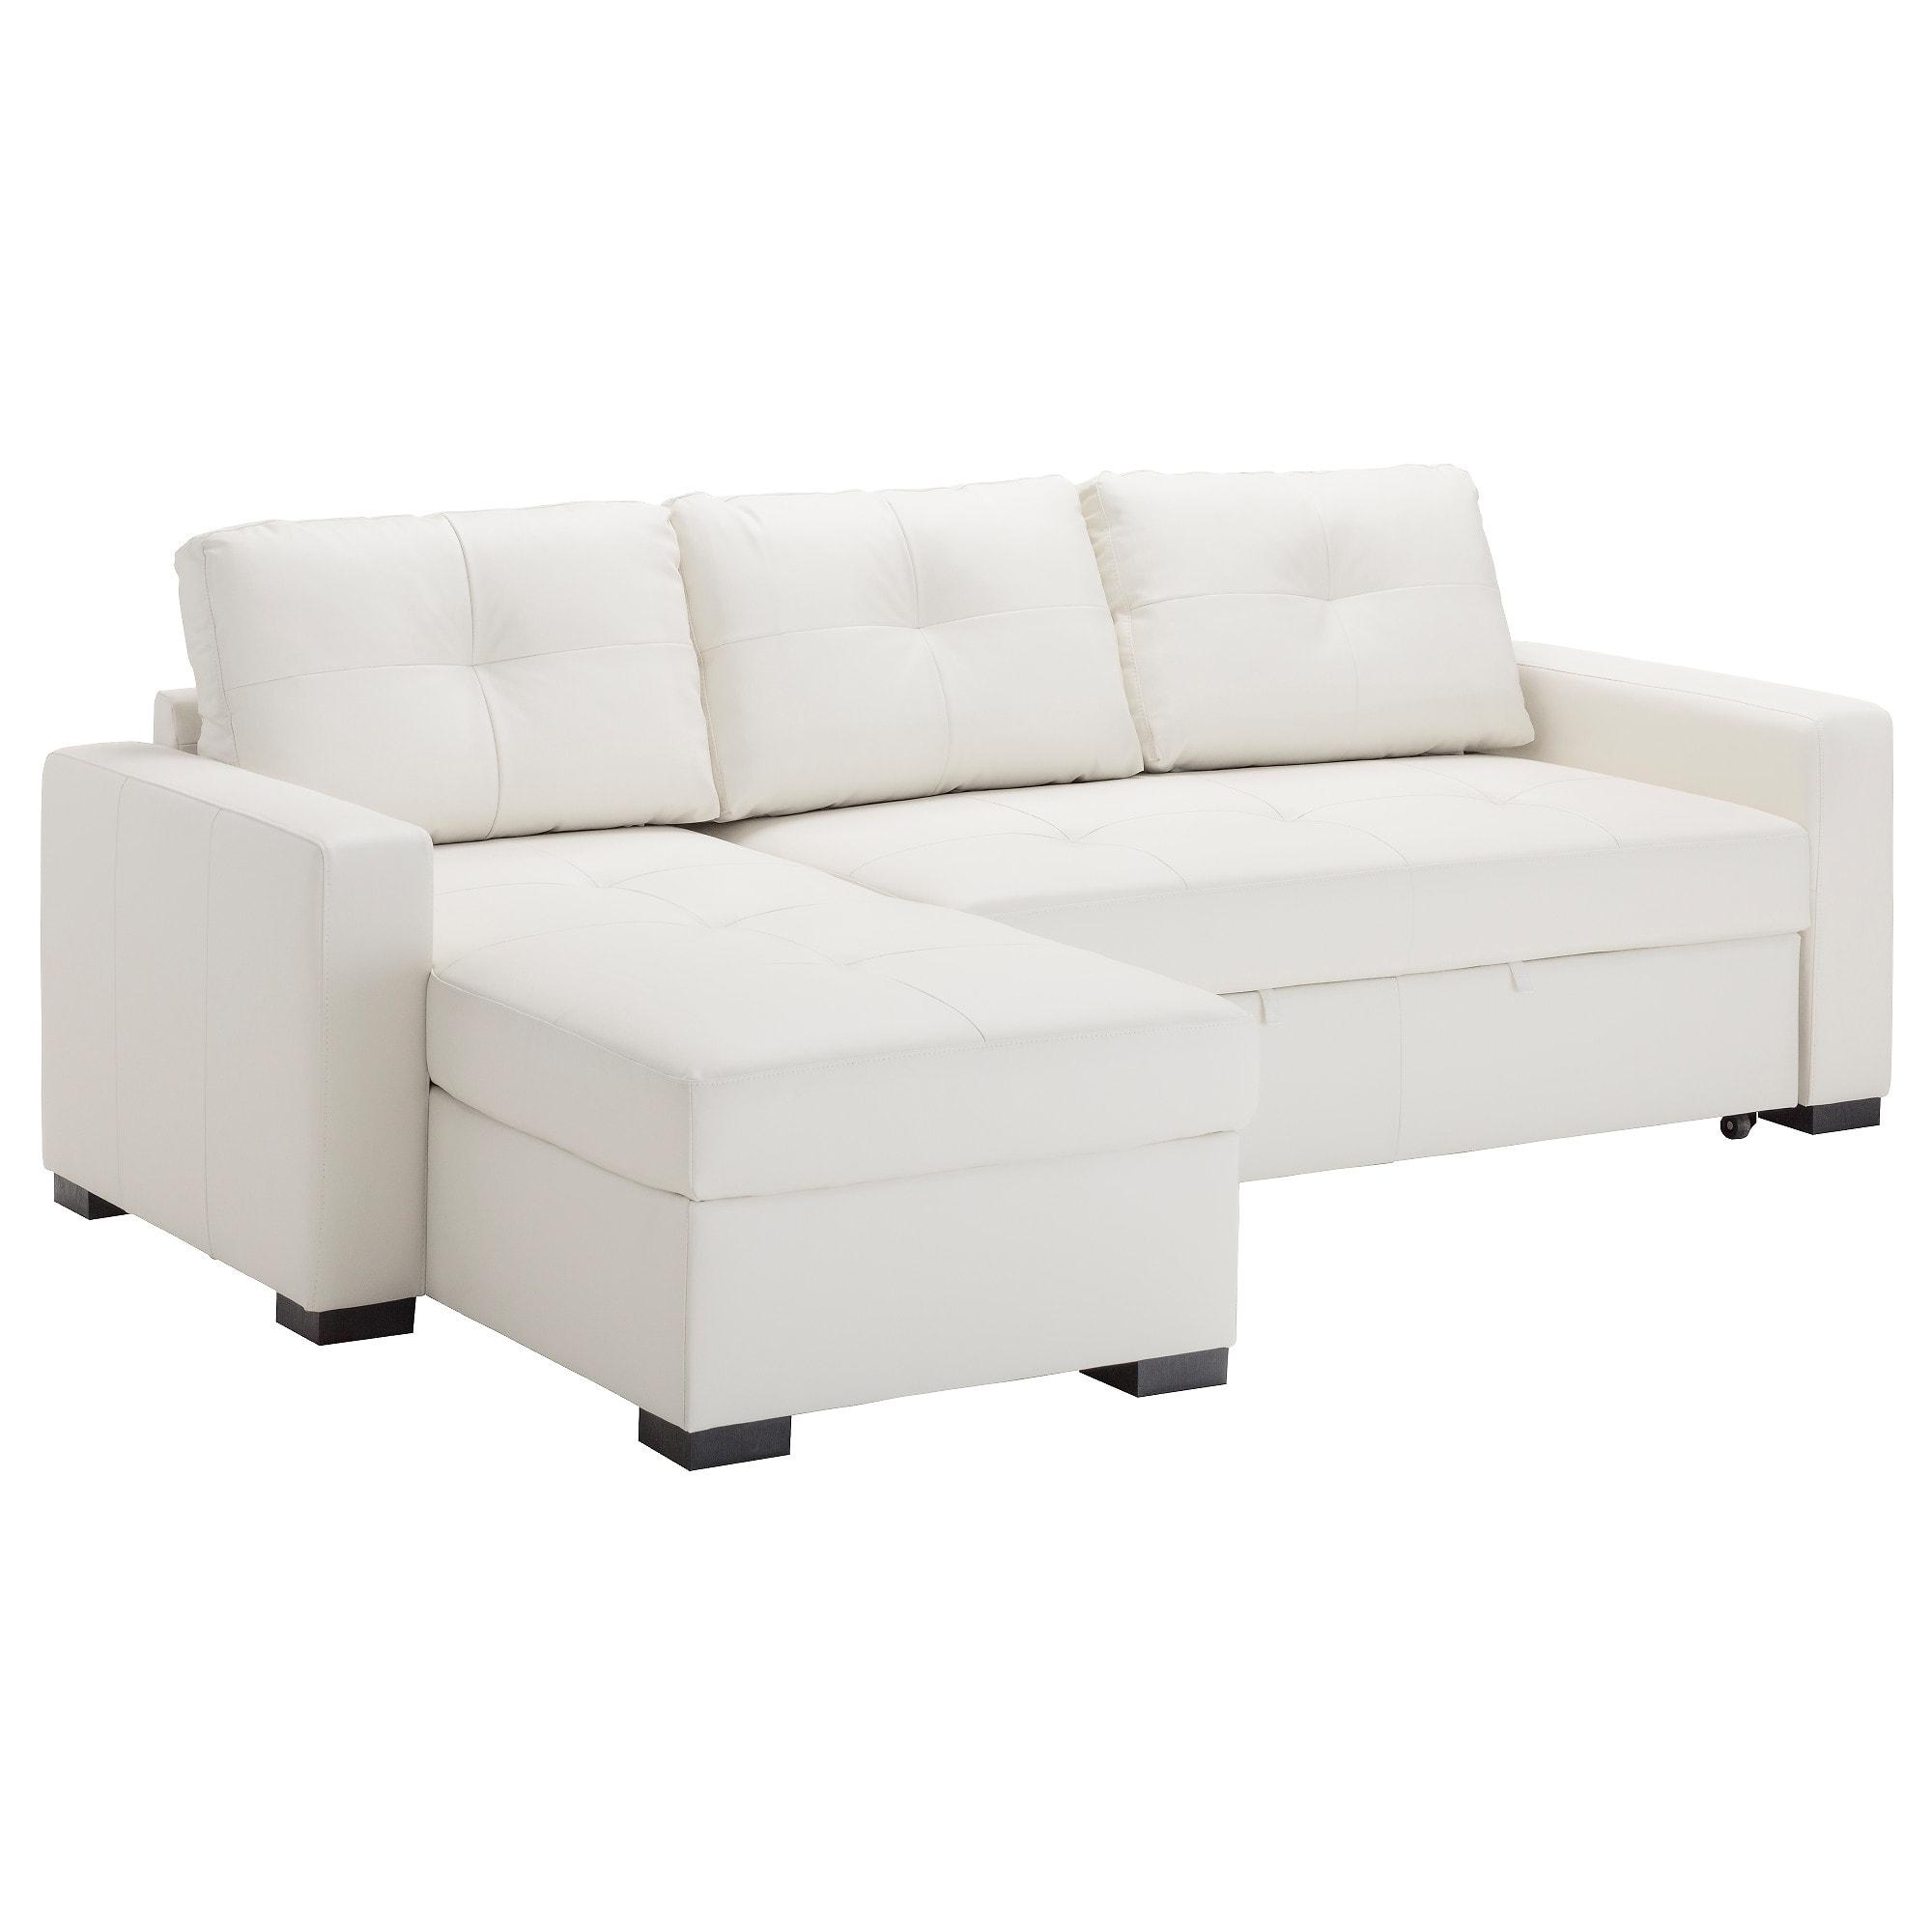 Sofa Camas Mndw Ragunda sofà Cama Esquina Con Almacenaje Kimstad Hueso Ikea